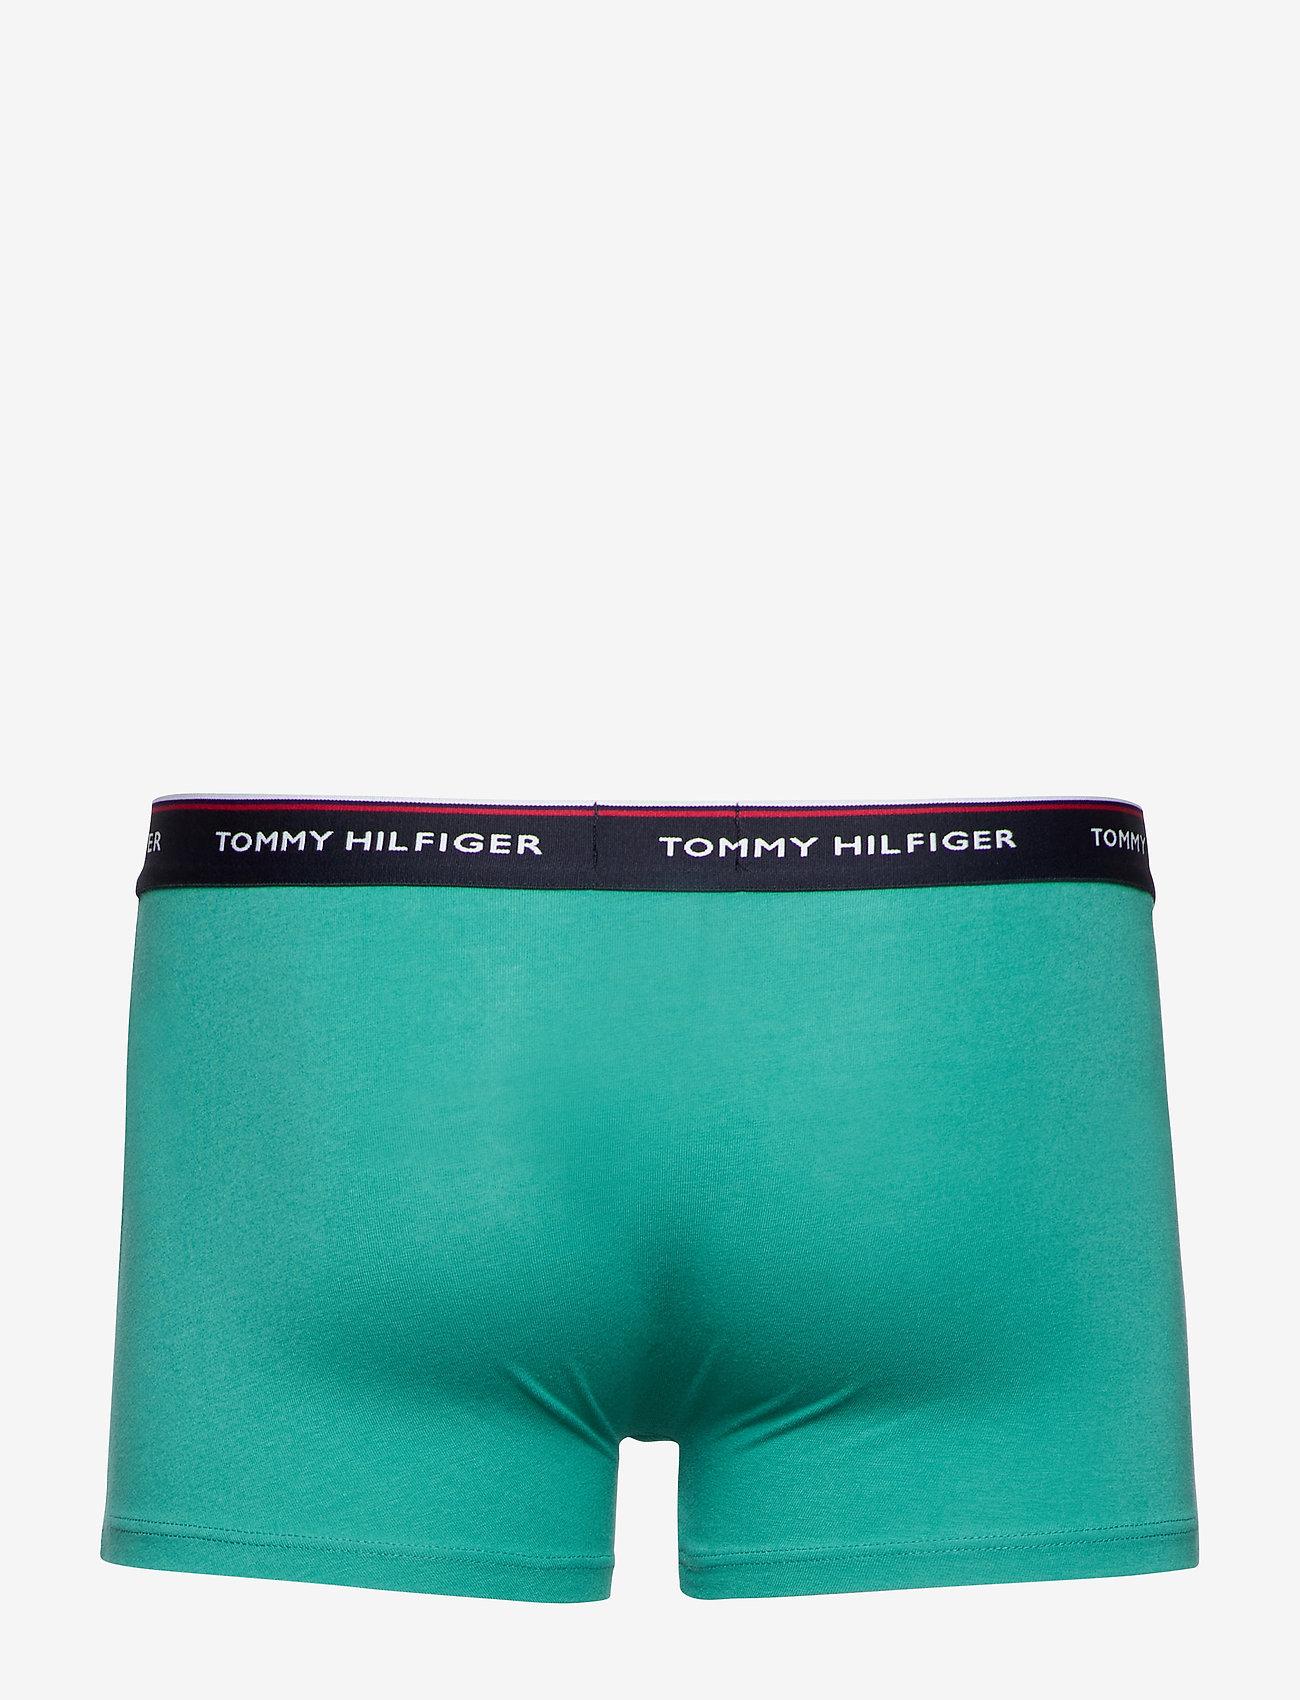 Tommy Hilfiger - Trunk 3 pack premium essentials - boxers - desert sky/country club/summit - 3